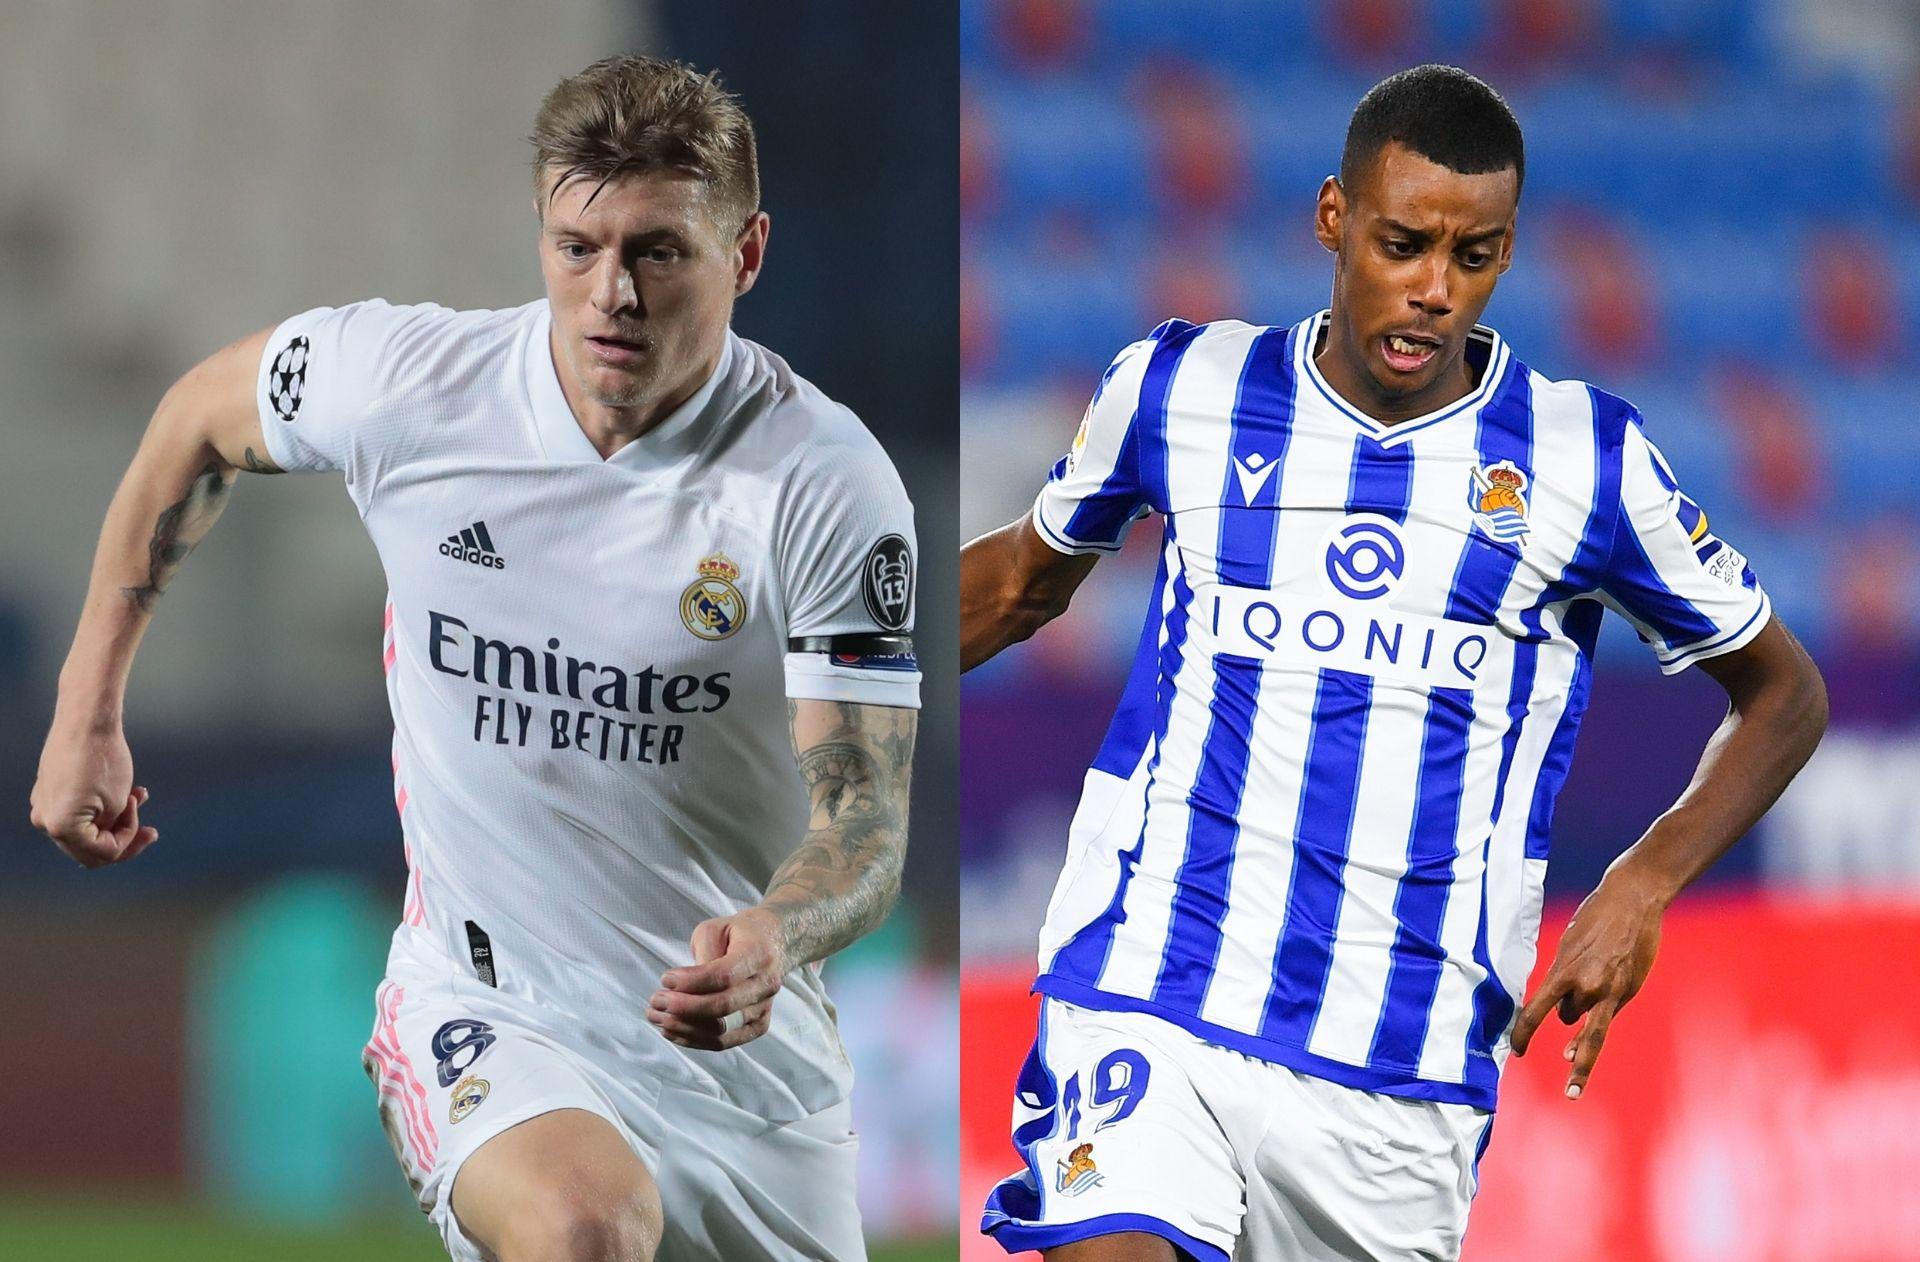 Real Madrid vs Real Sociedad: La Liga